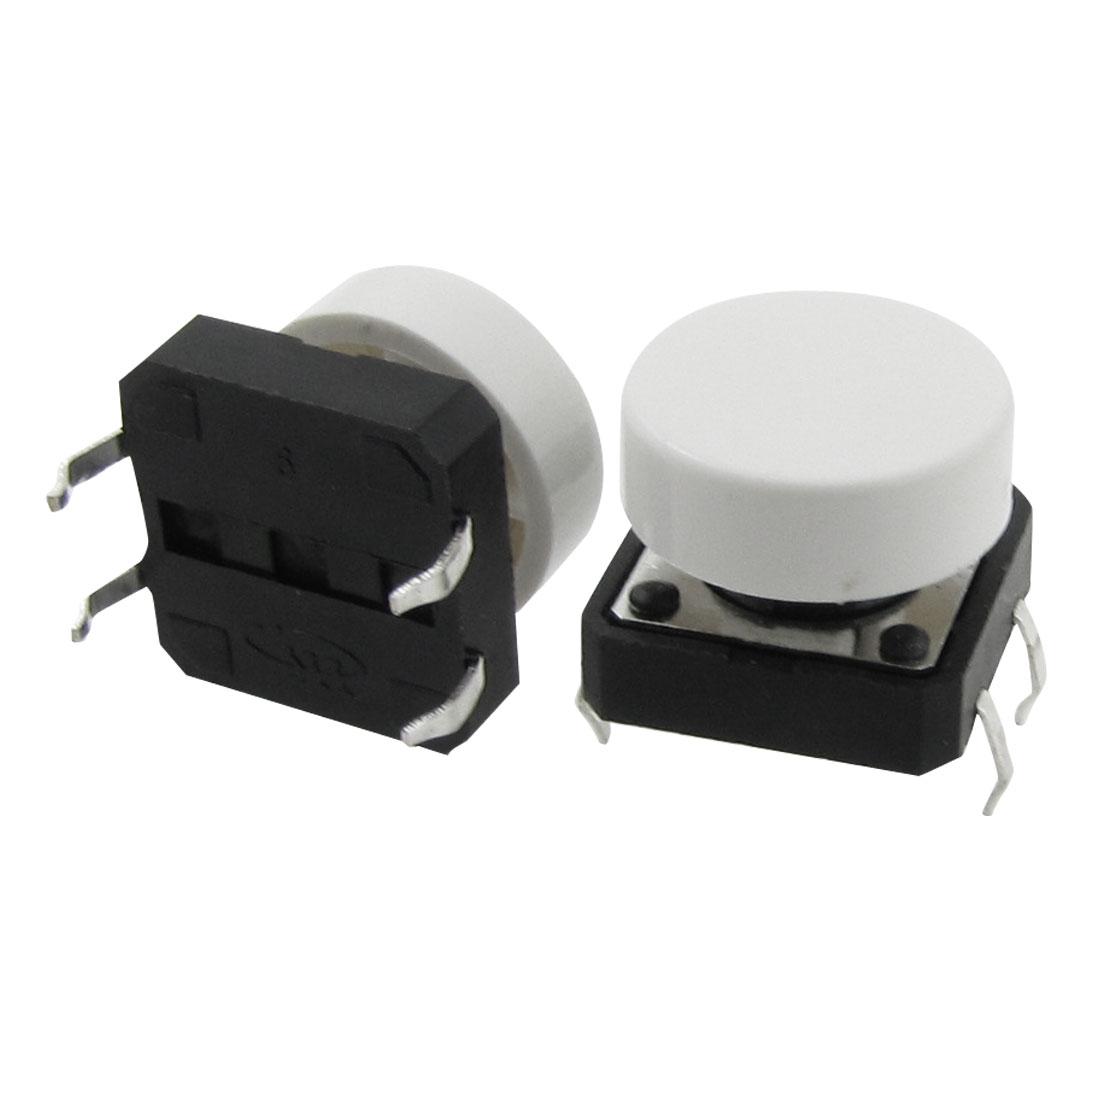 10pcs Momentary Tact Tactile Push Button Switch 12 x 12mm x 10mm 4 Pin DIP + Cap